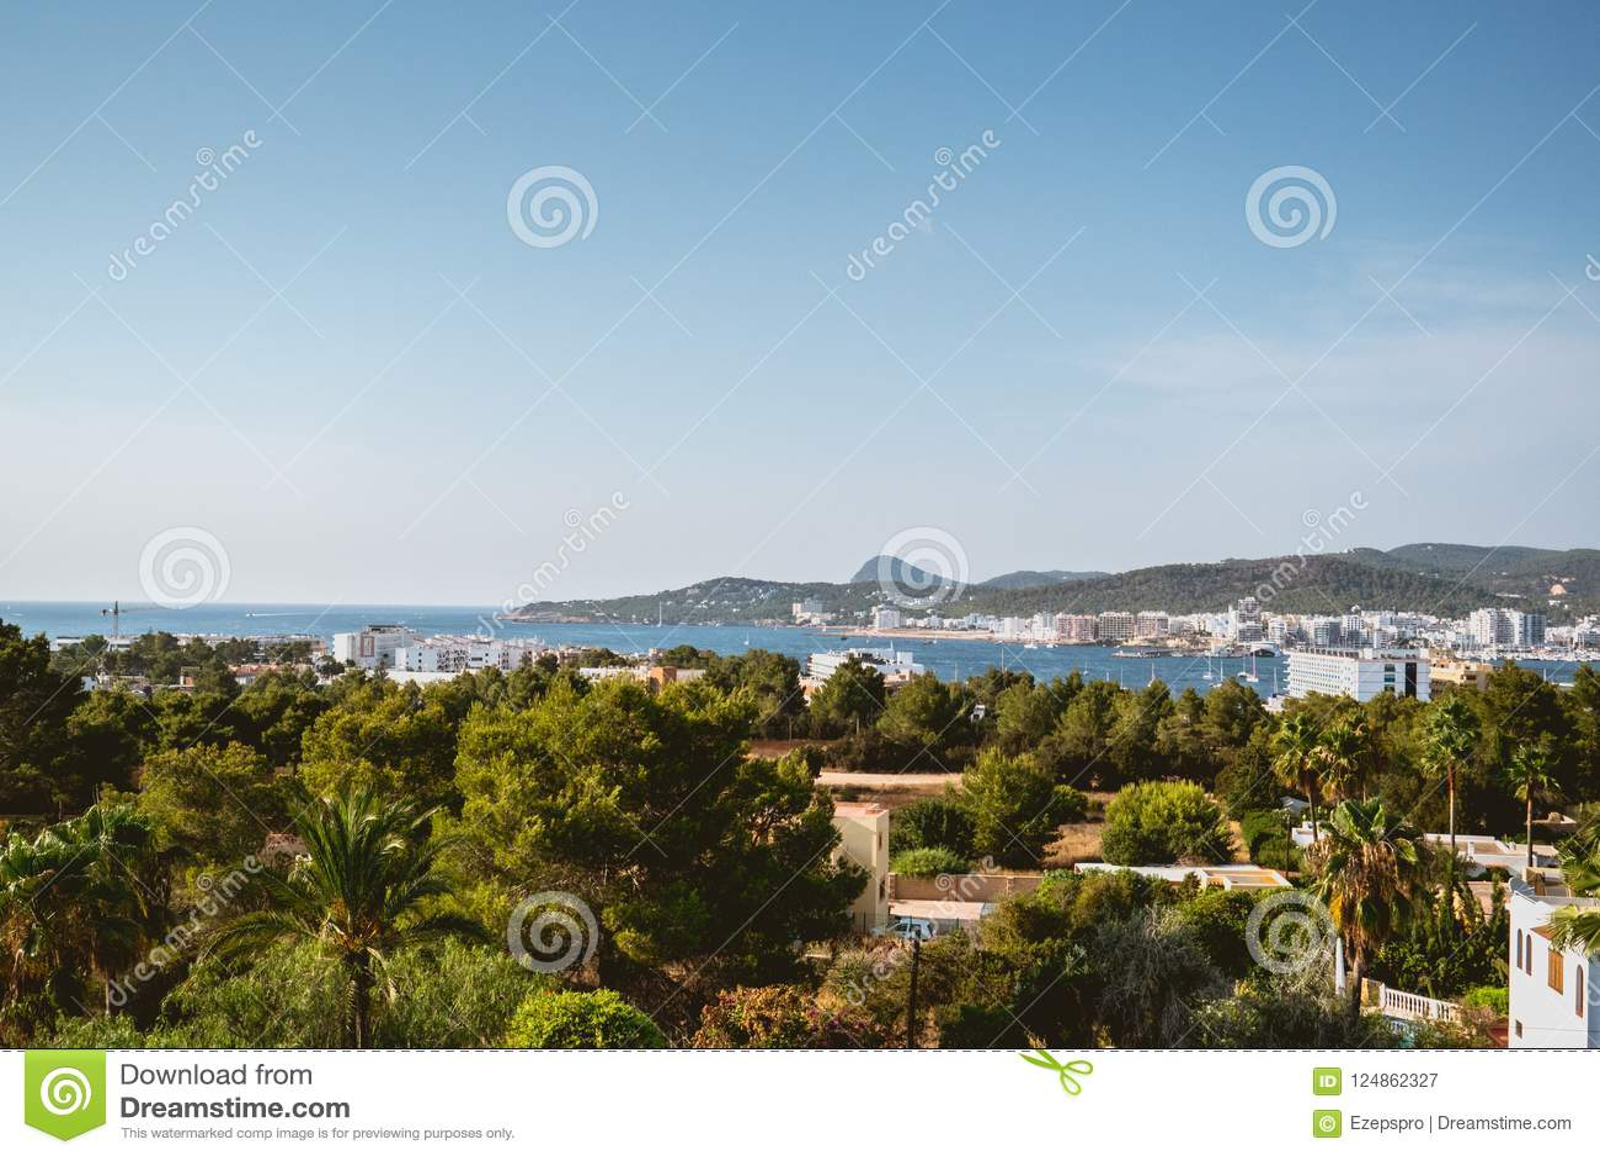 Panorama van San Antonio Bay, Ibiza, Spanje